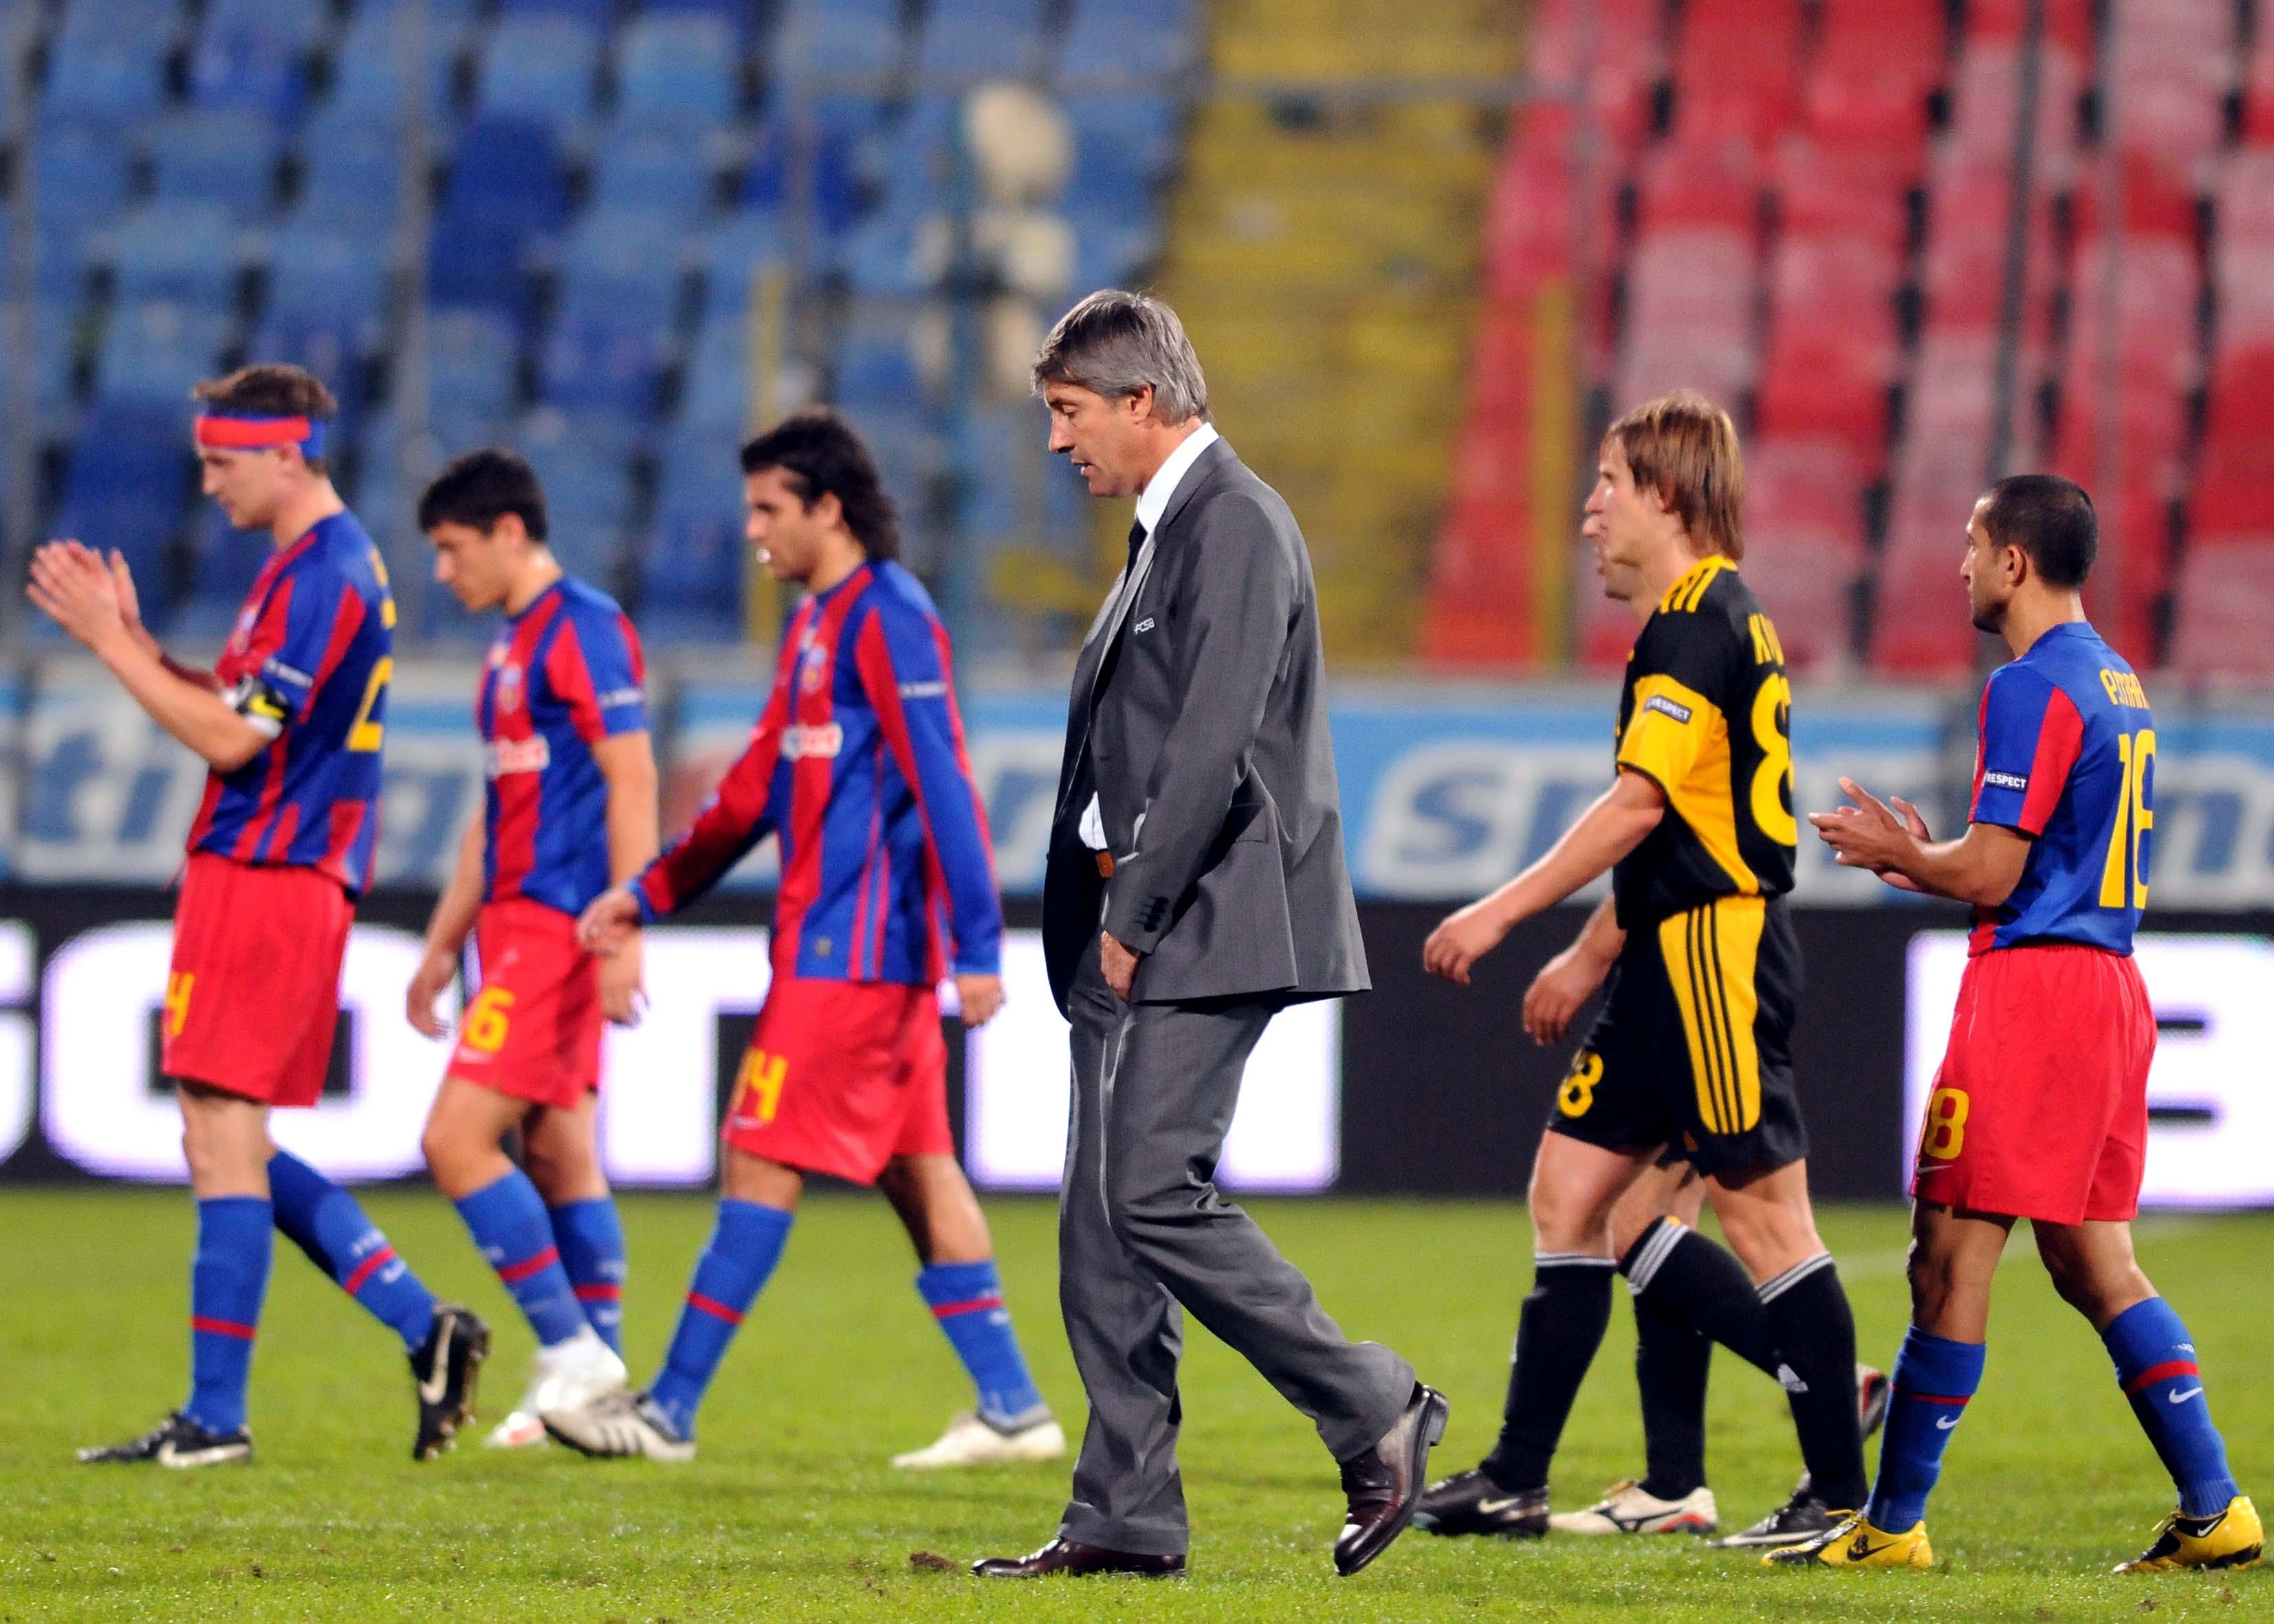 FCSB - Sheriff Tiraspol 0-0 (sursă foto: sportpictures.eu)